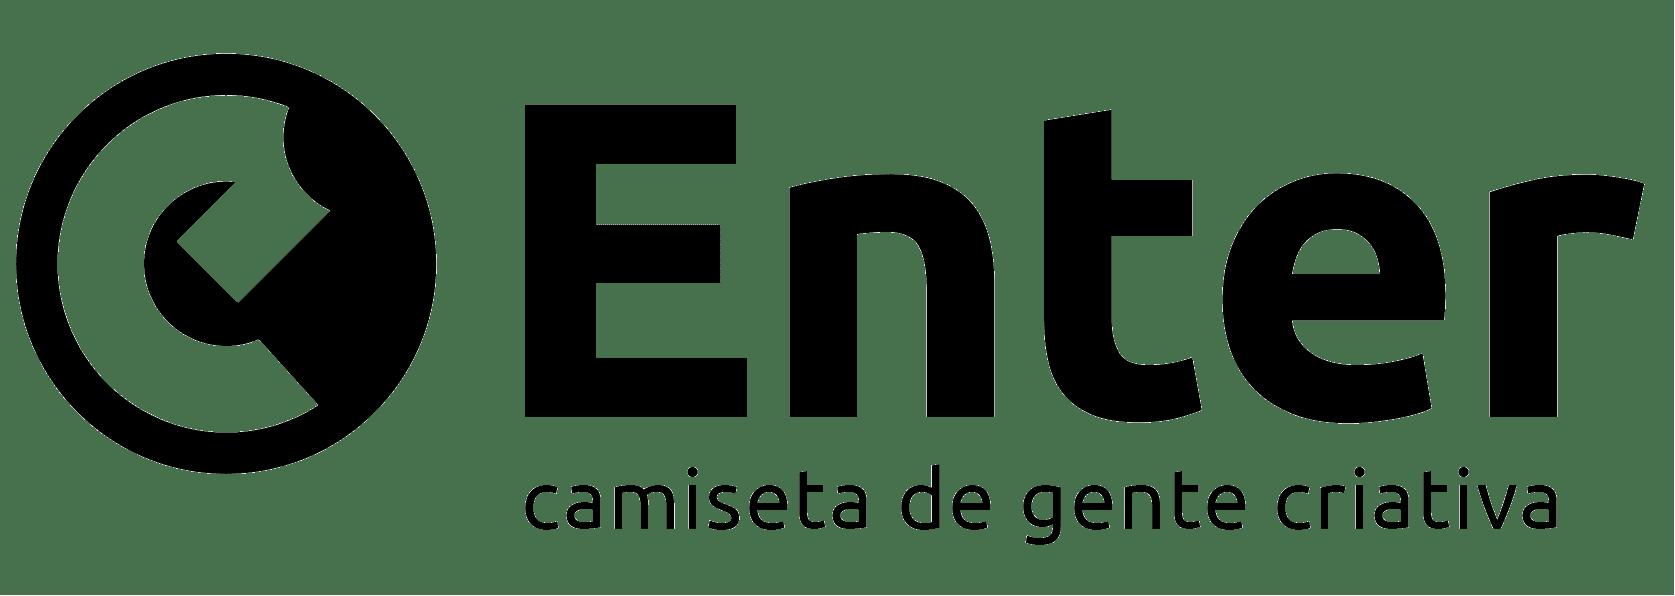 (c) Entertshirt.com.br